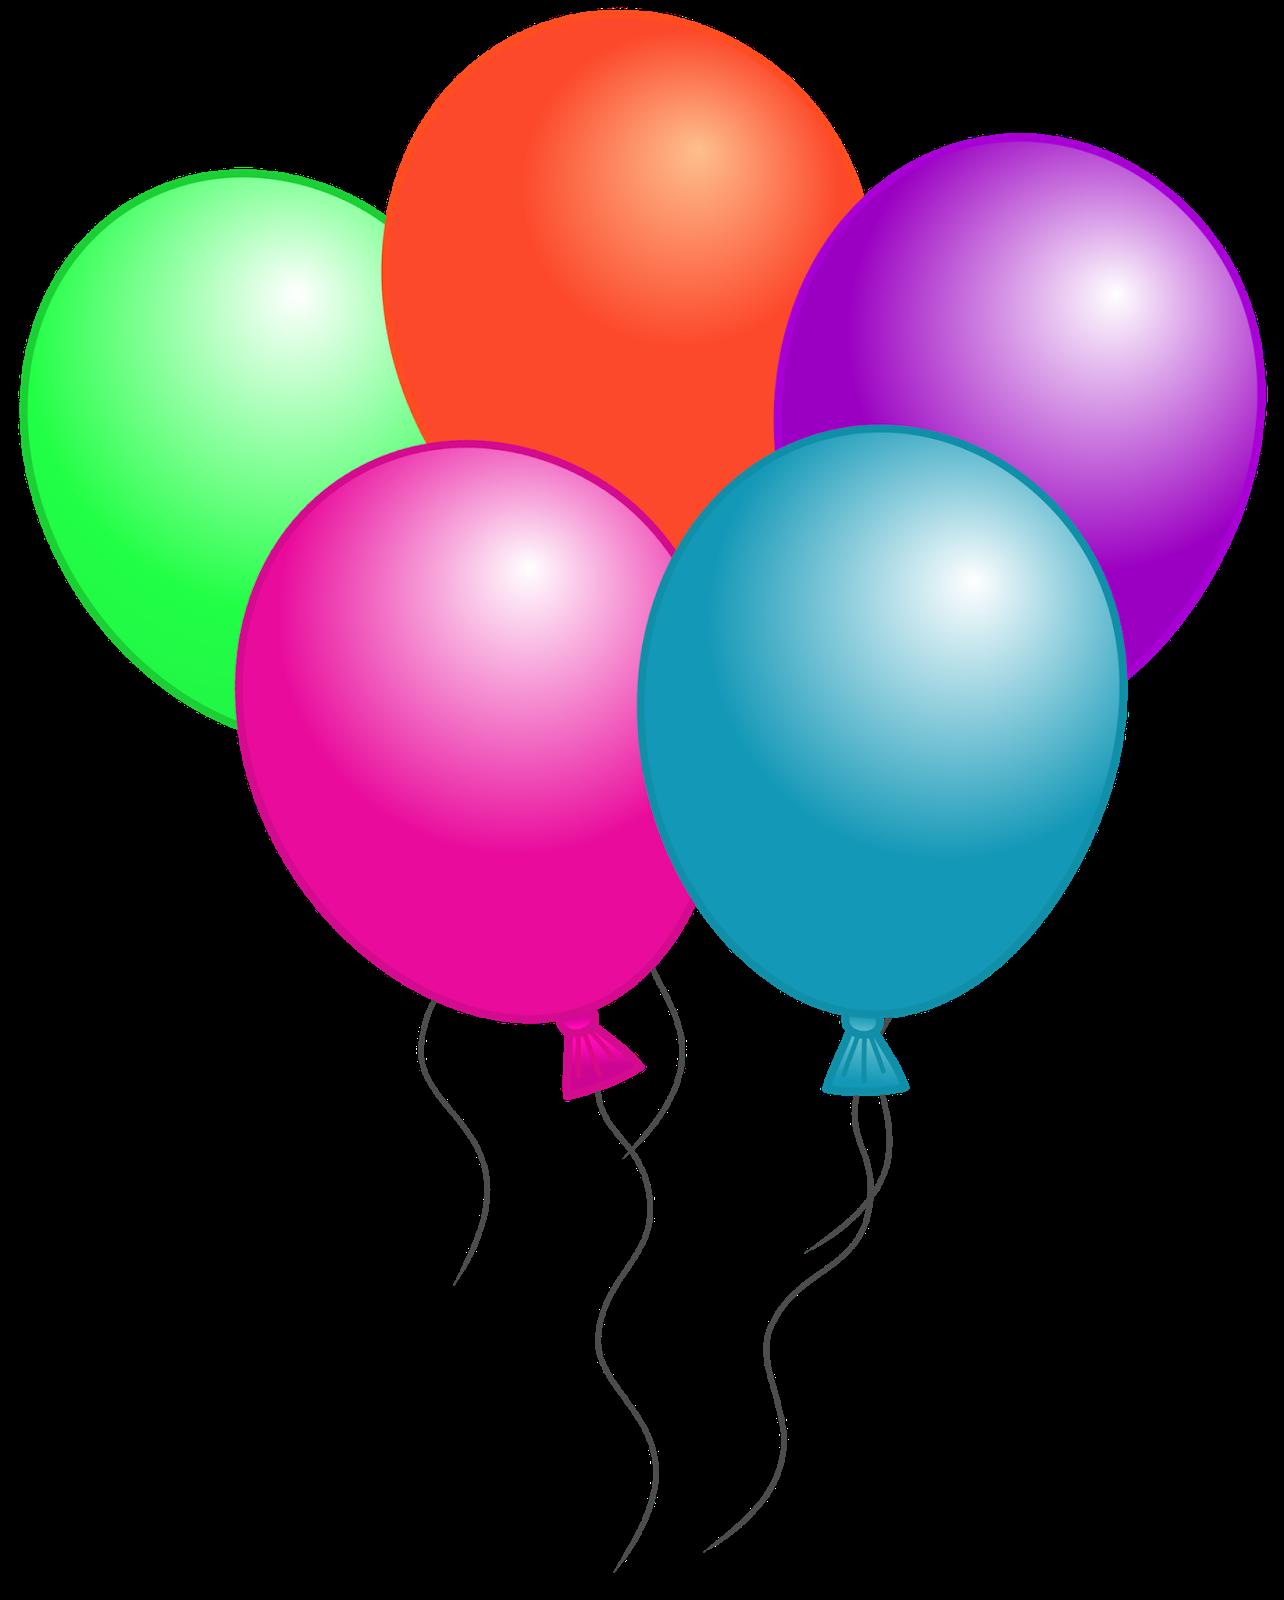 Balloon Clipart Png Clipart Panda Free C-Balloon Clipart Png Clipart Panda Free Clipart Images-9